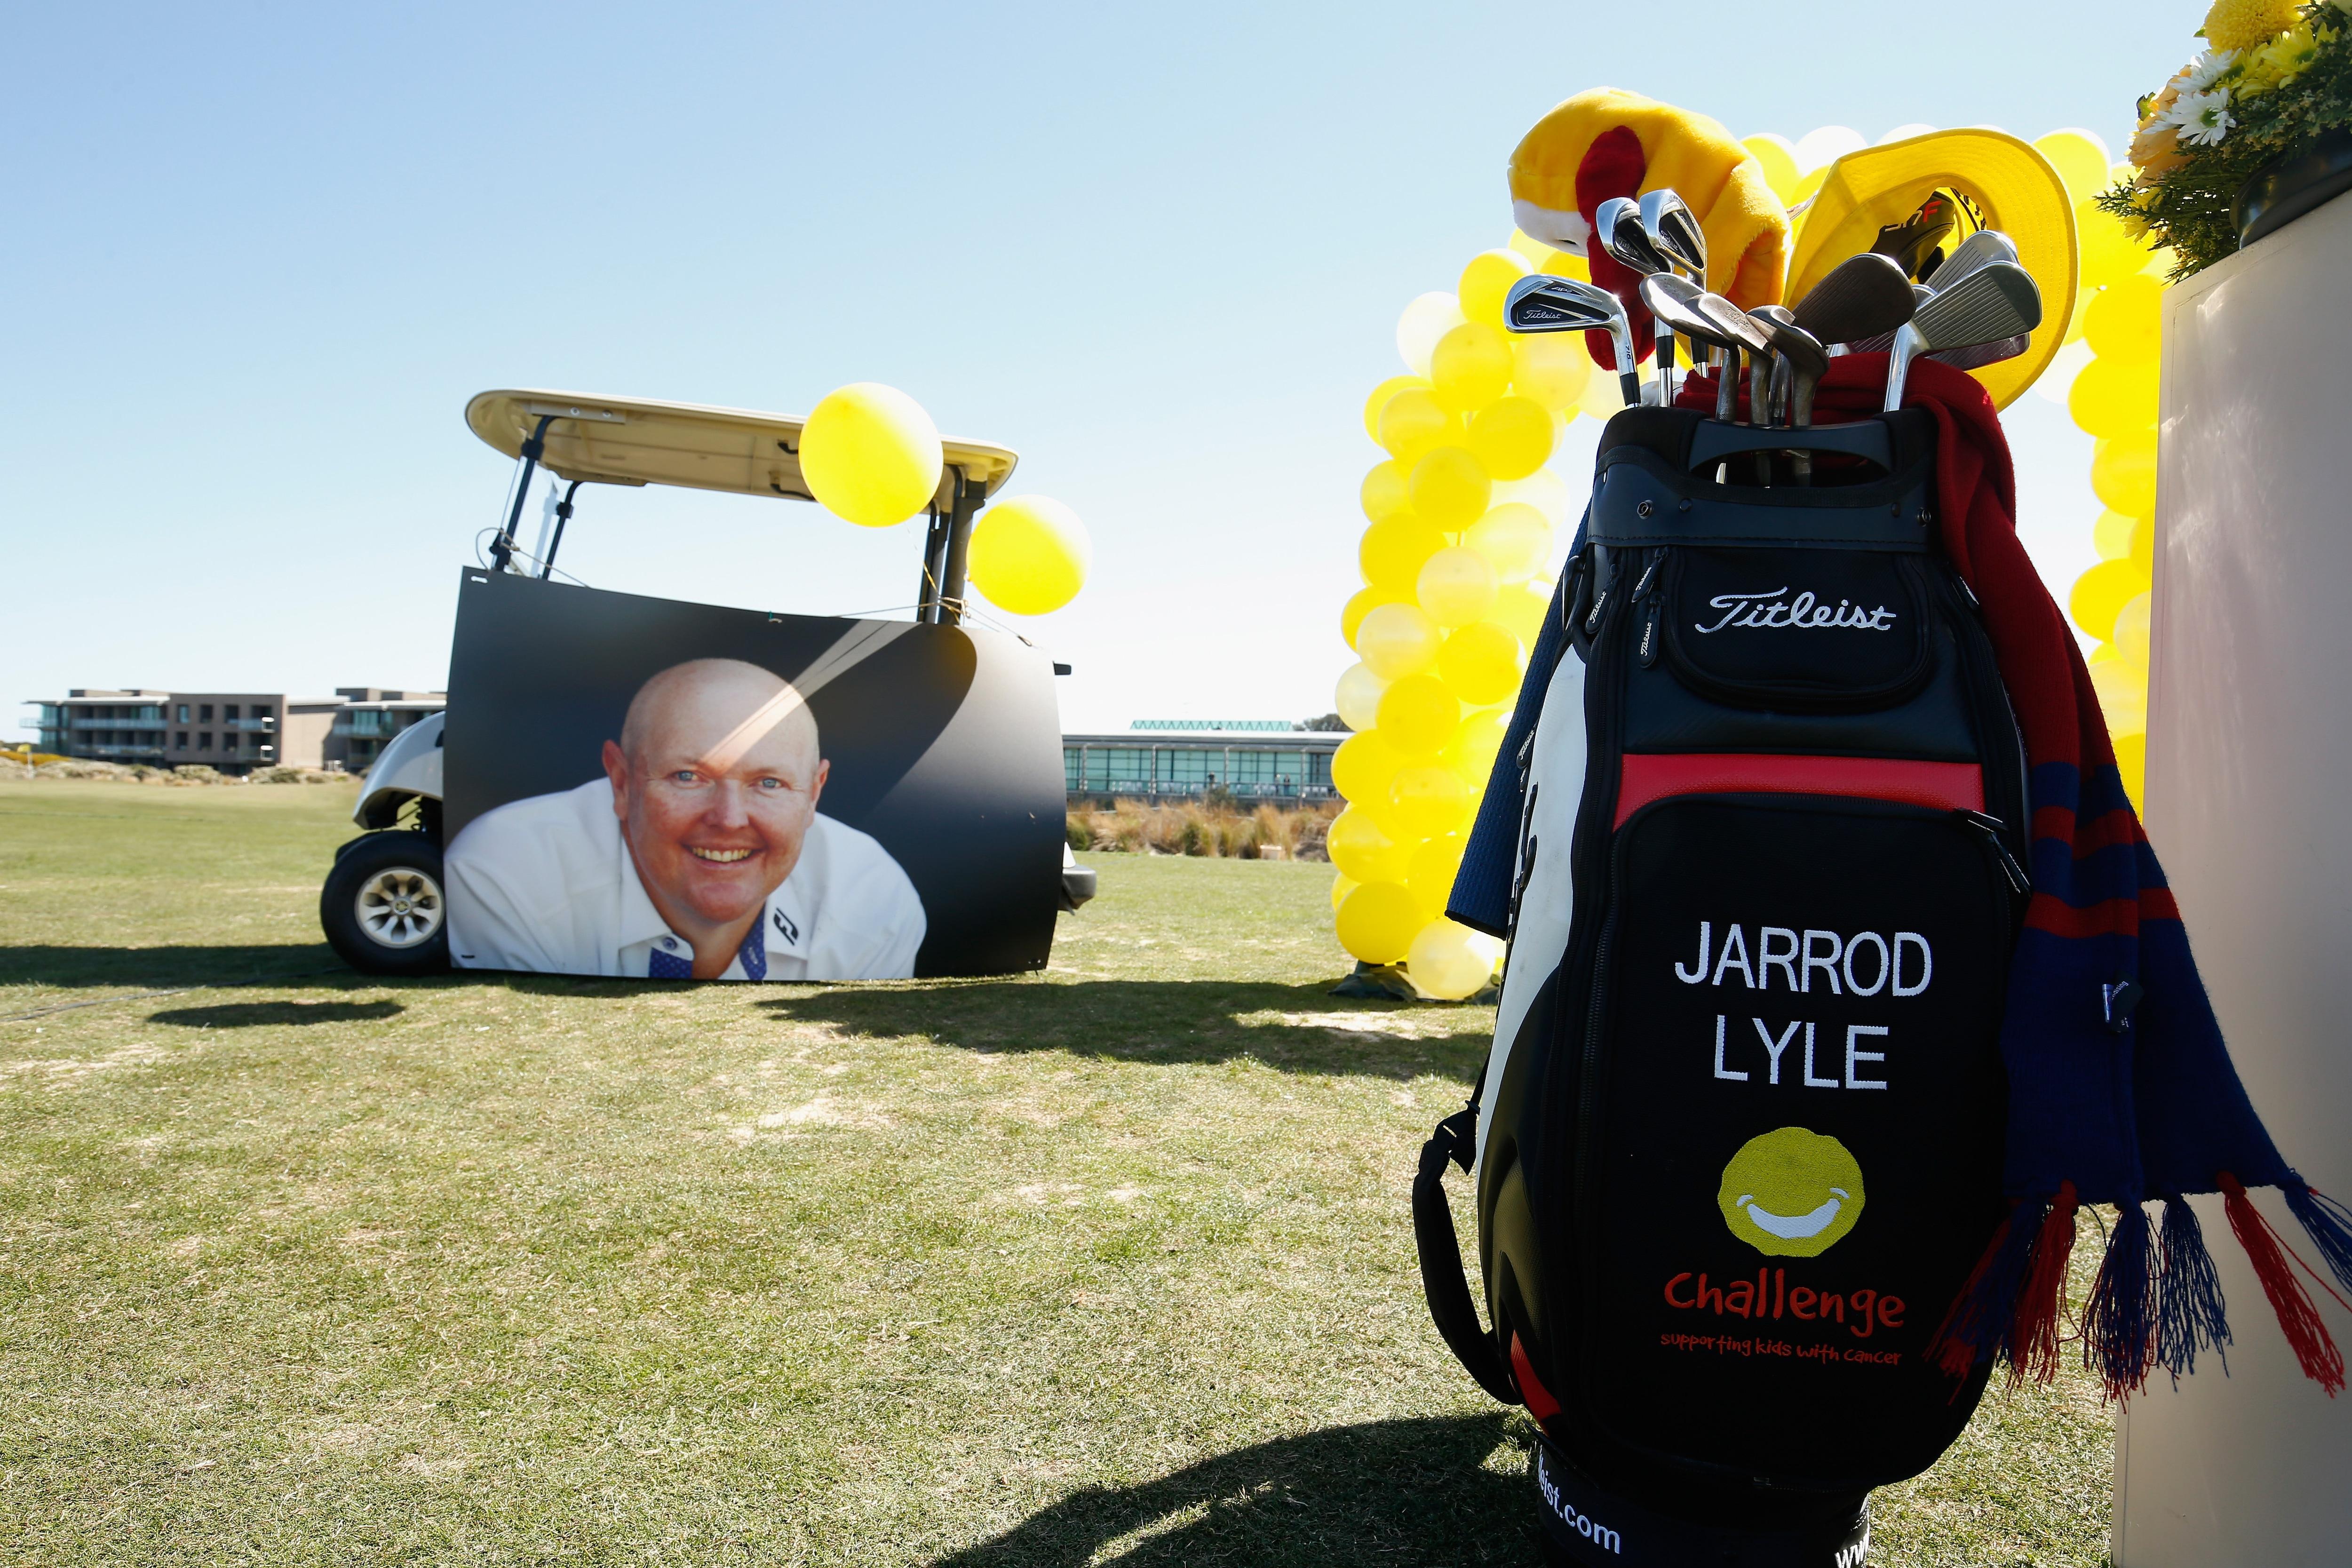 Jarrod Lyle's memorial service